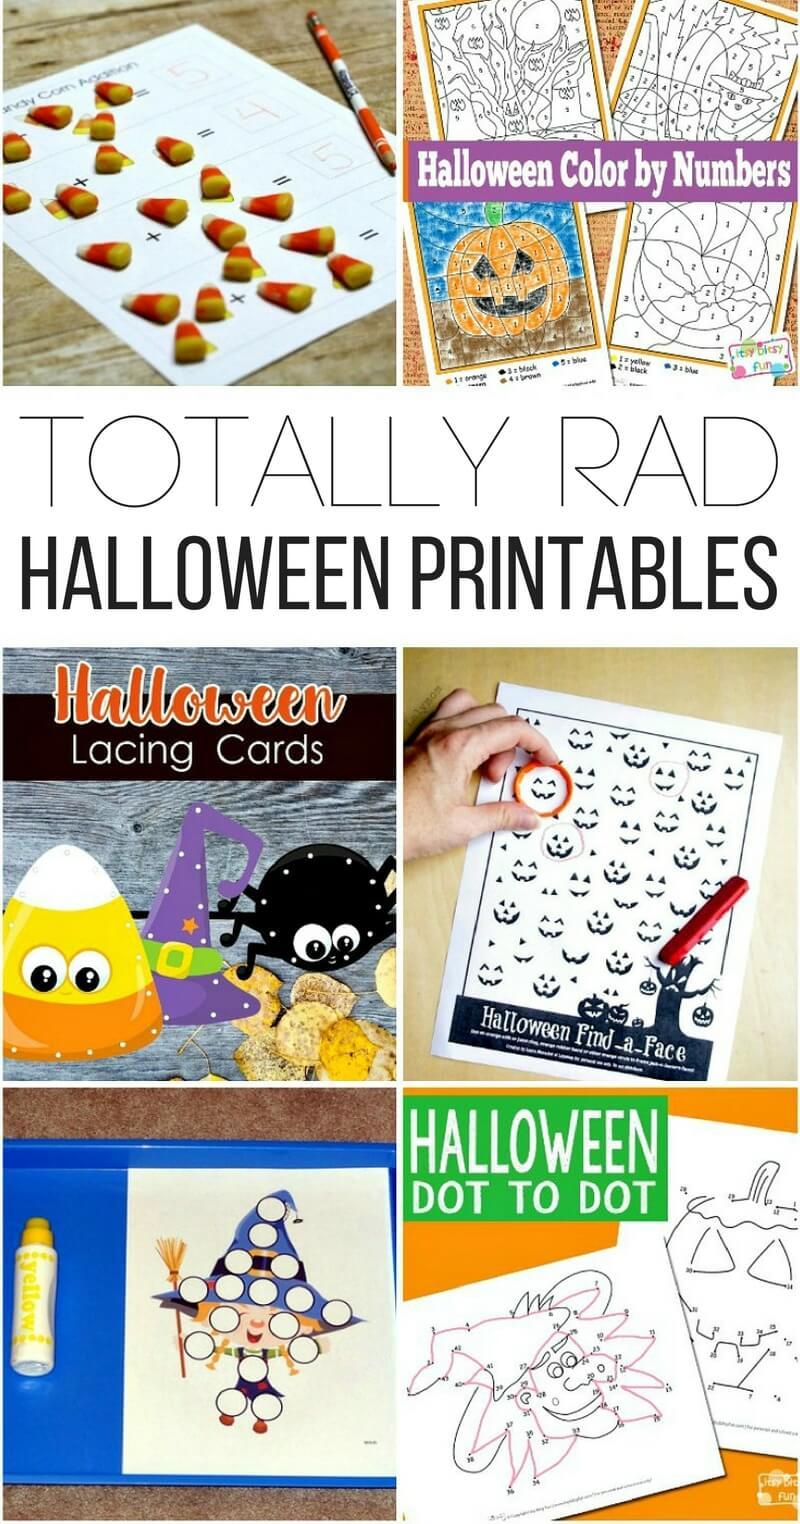 medium resolution of Totally Rad Halloween Printables for Kids